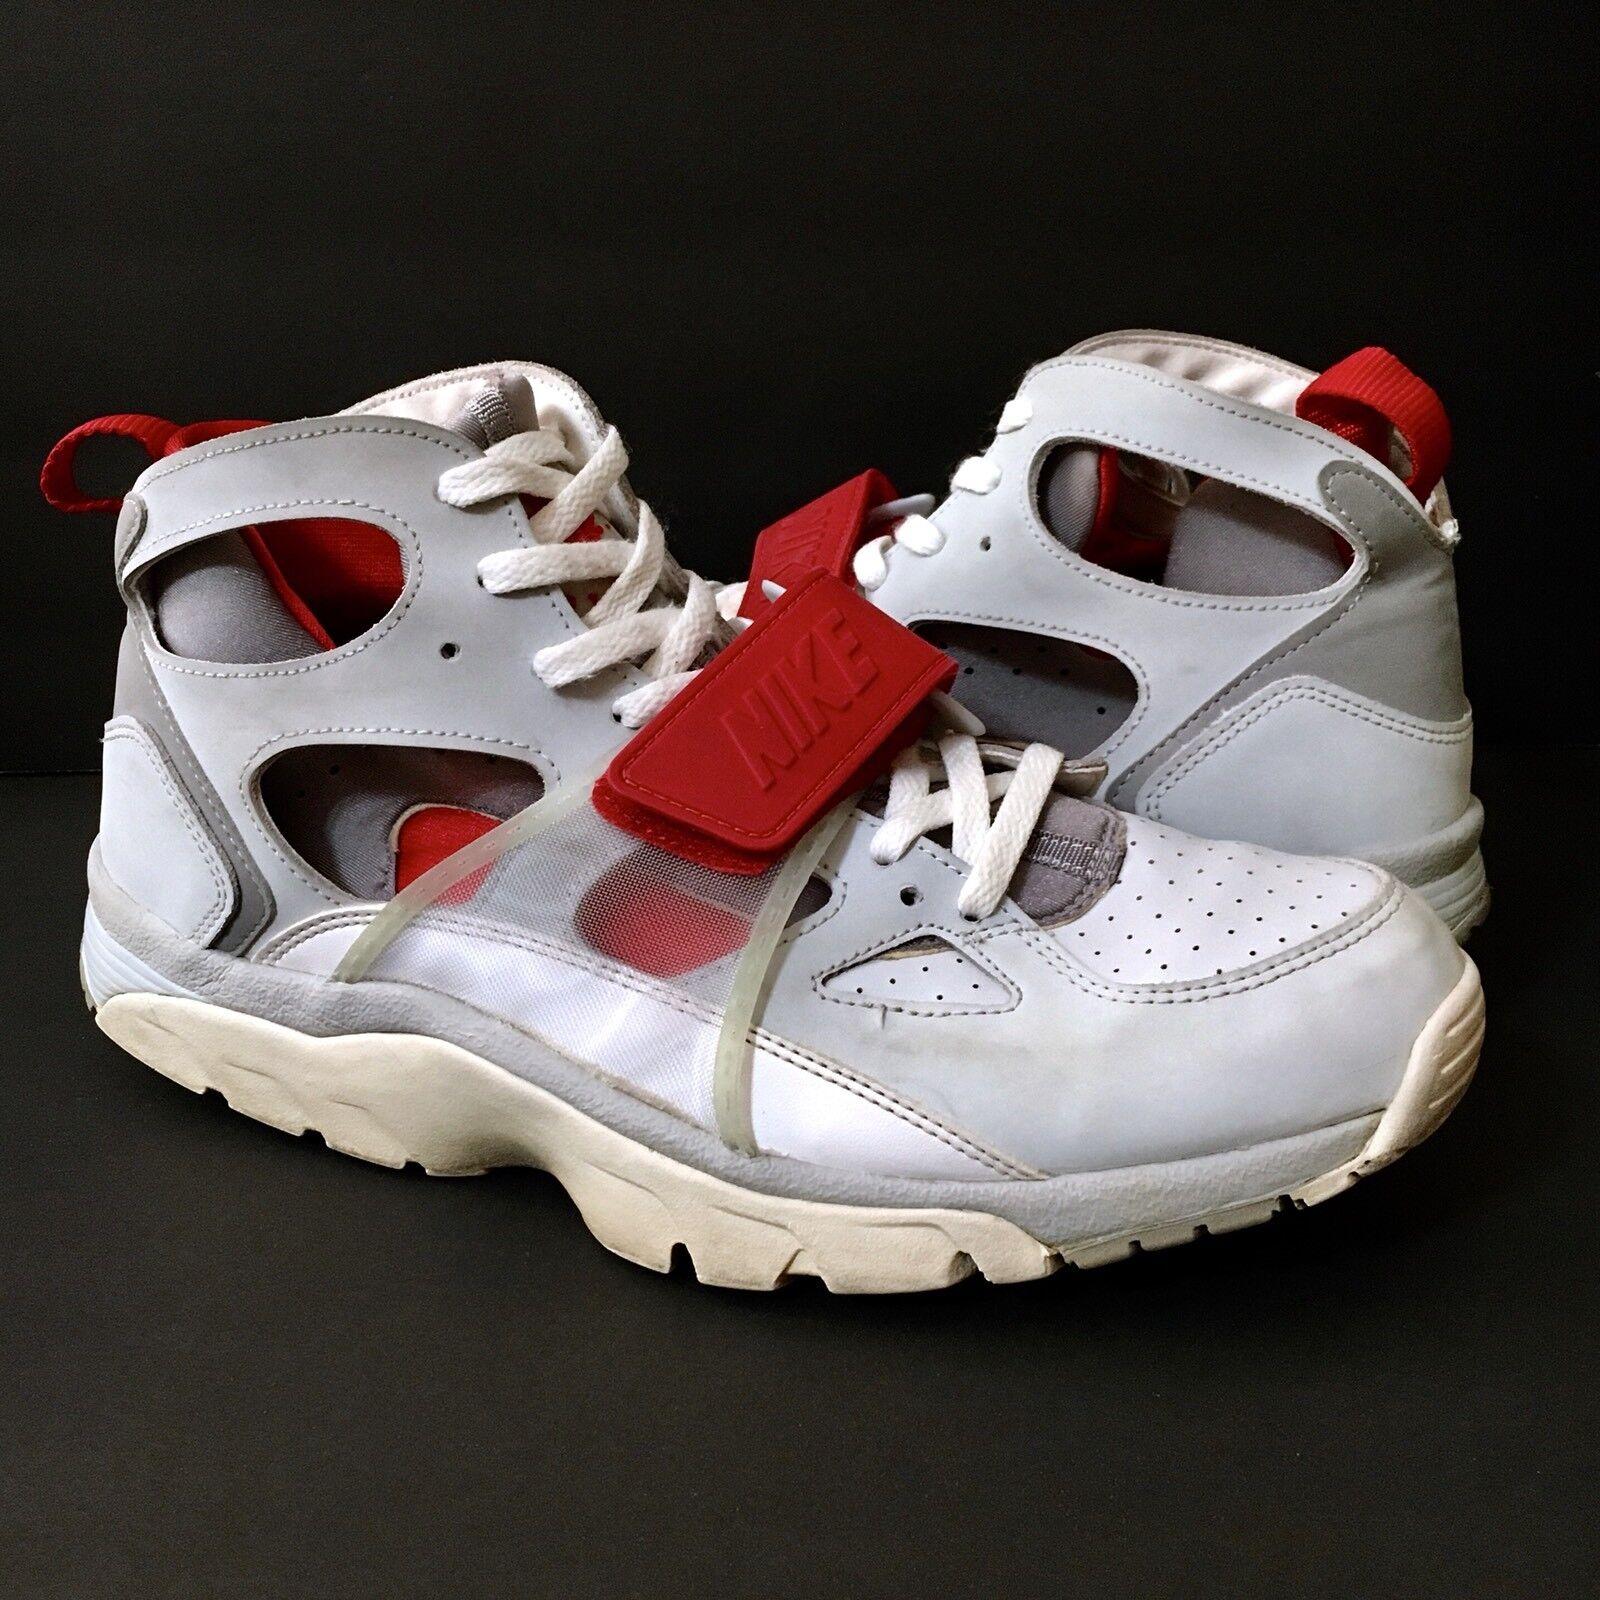 NIKE Air Trainer Huarache Men's Pure Platinum Grey Red White 679083-017 Sz 11